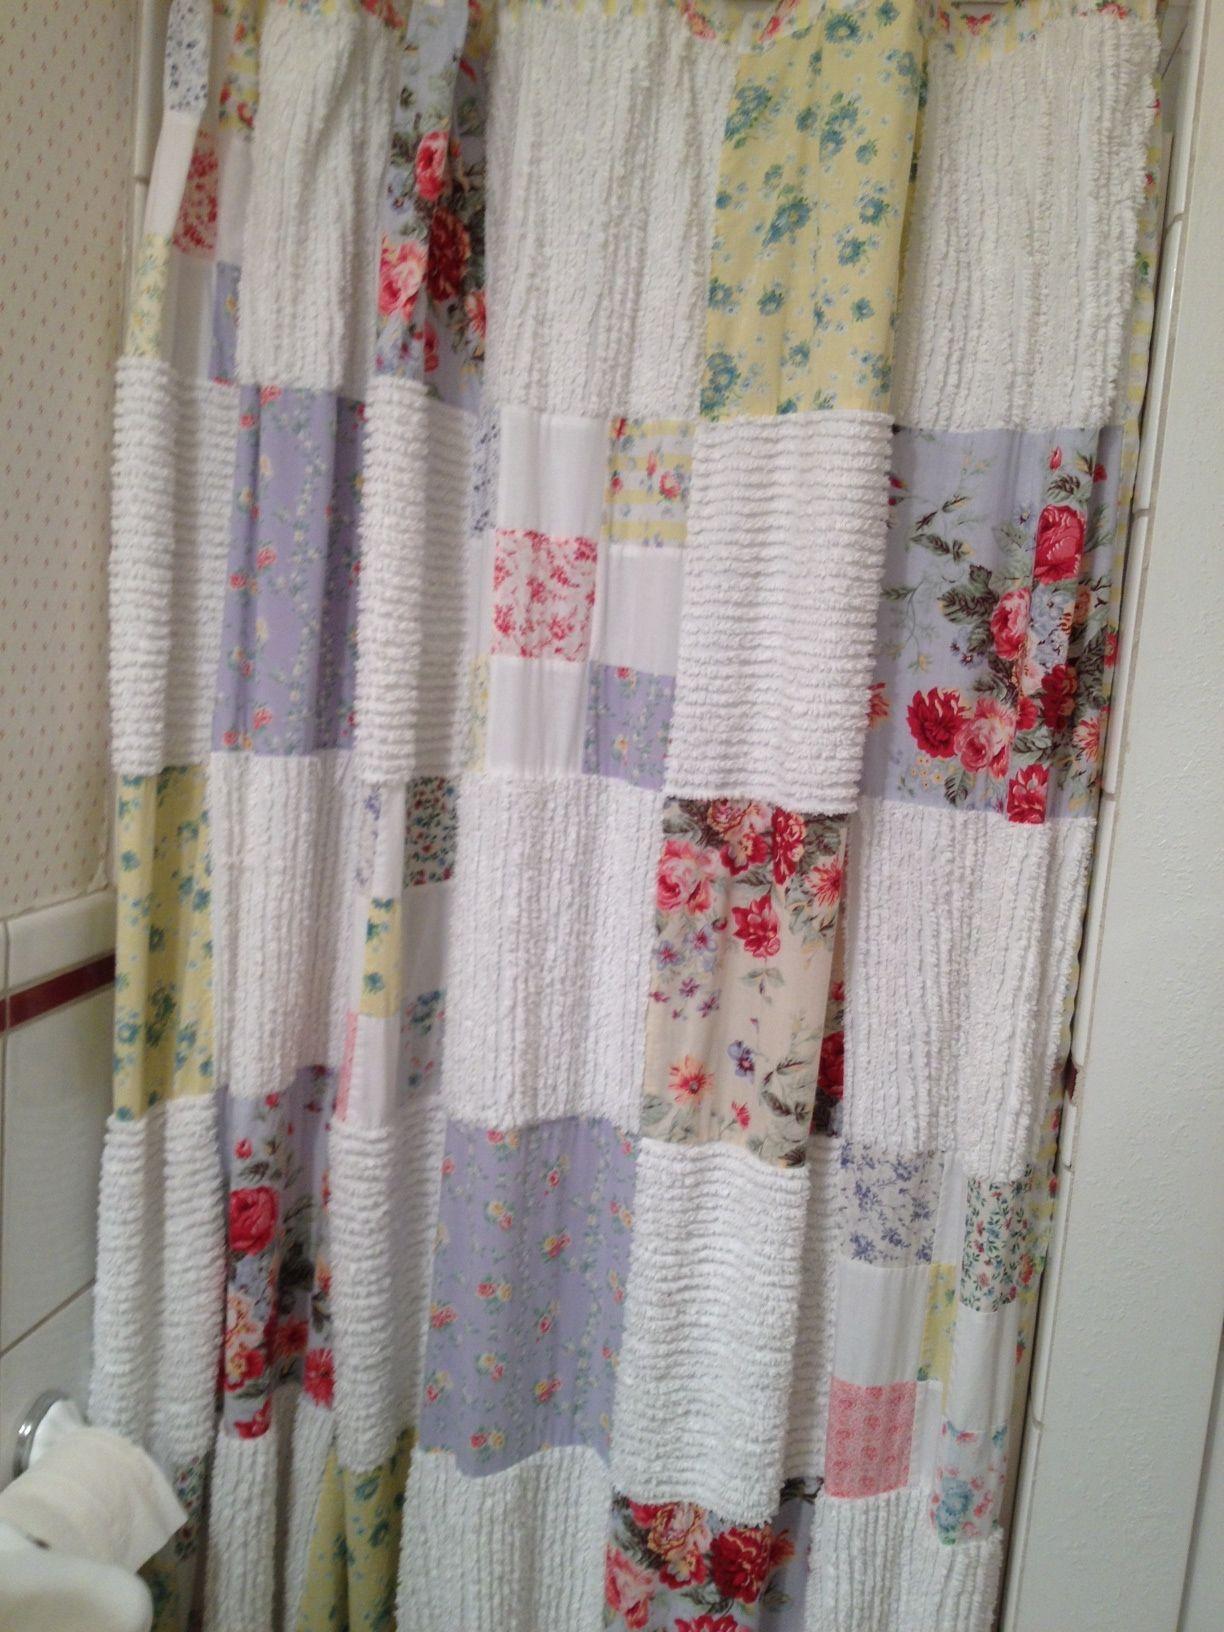 patchwork shower curtain  patchwork ideas  Pinterest  Patchwork